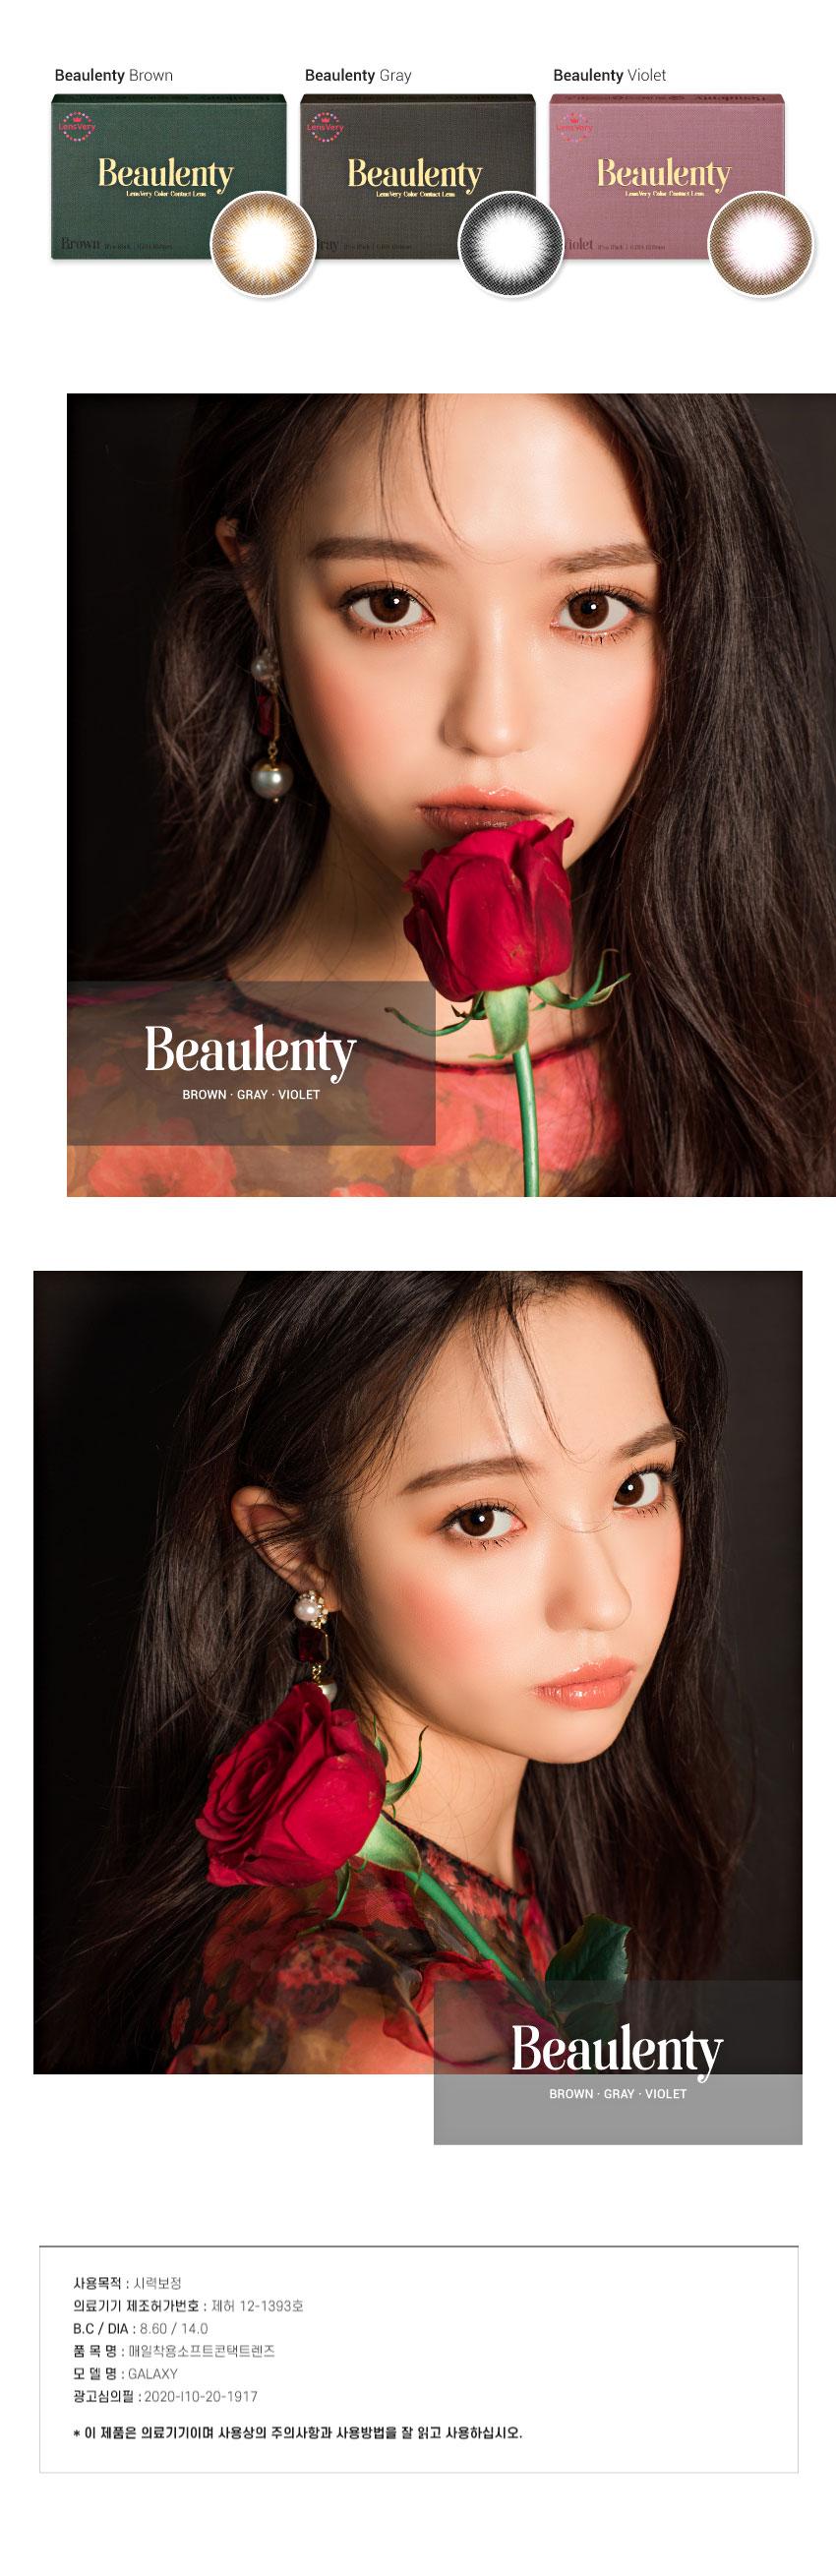 beaulenty-circle-lens-new2.jpg